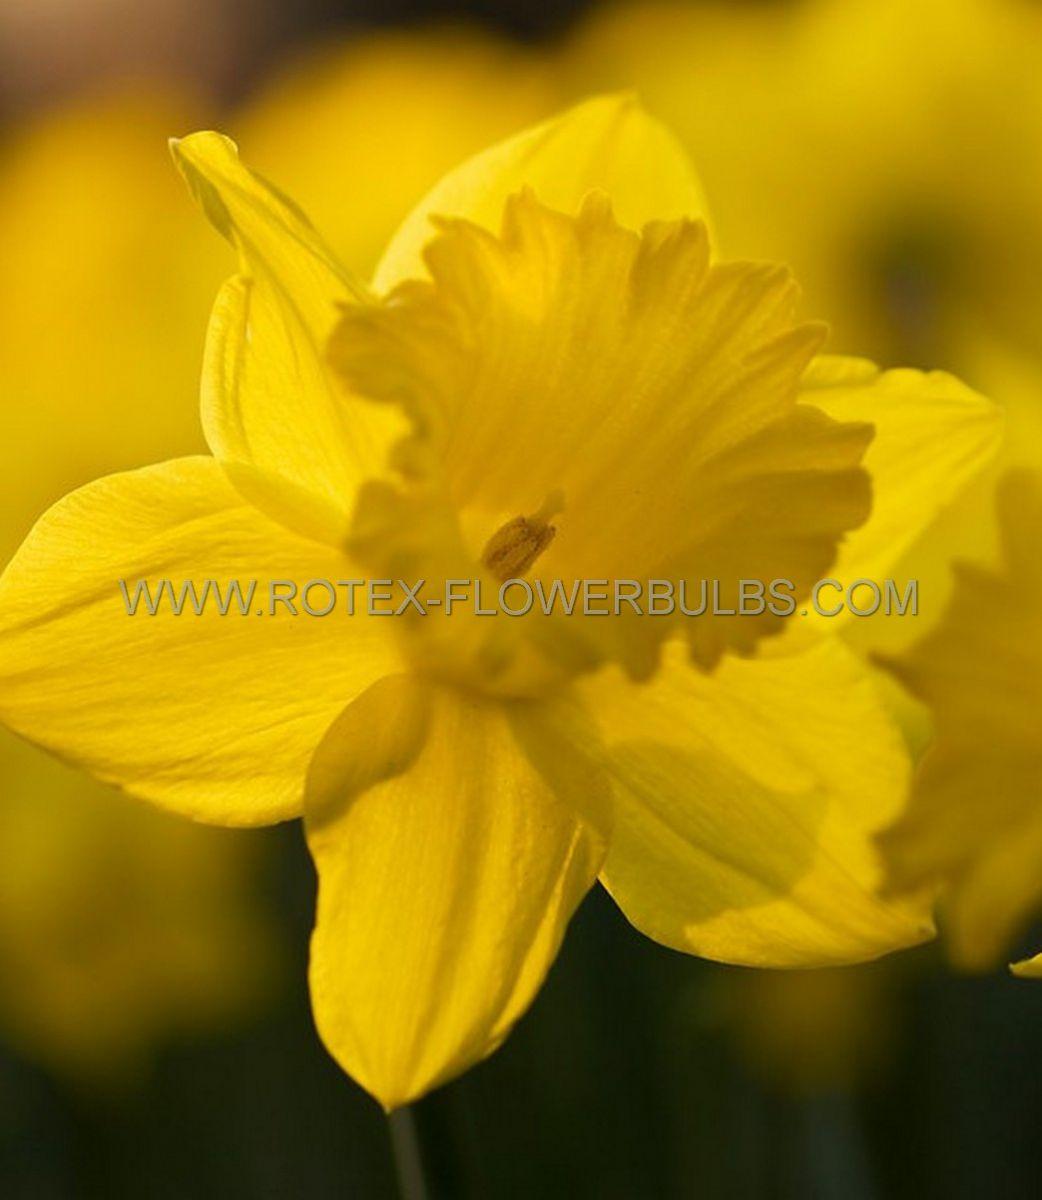 daffodil narcissus trumpet dutch master 1416 200 pplastic tray